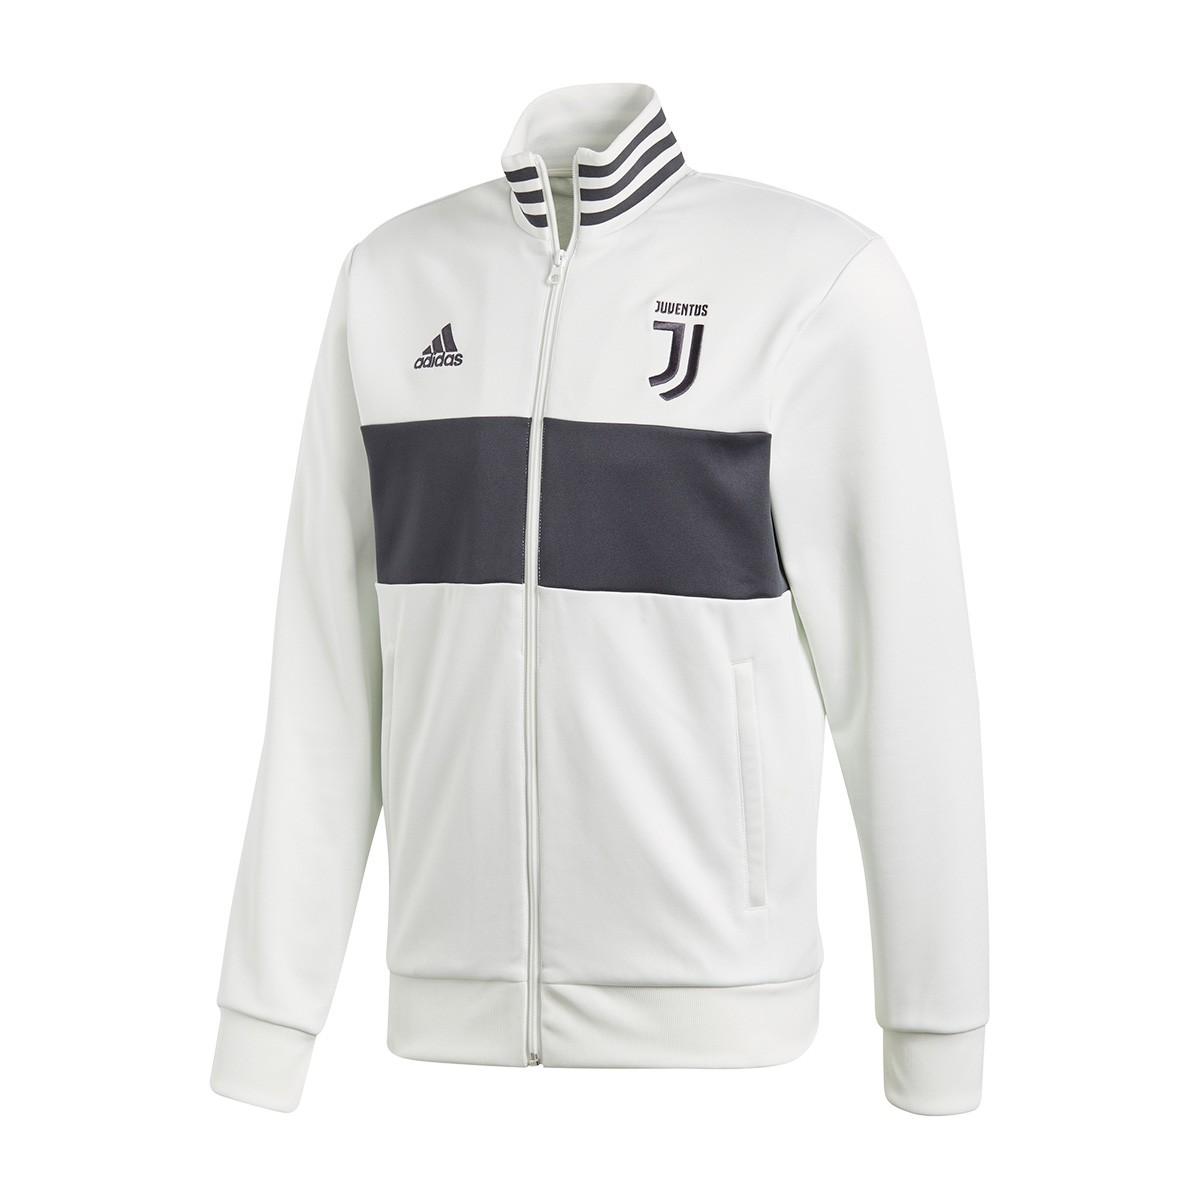 a26d15ce4b2 Jacket adidas Juventus 3S Top 2017-2018 White-Carbon - Football ...